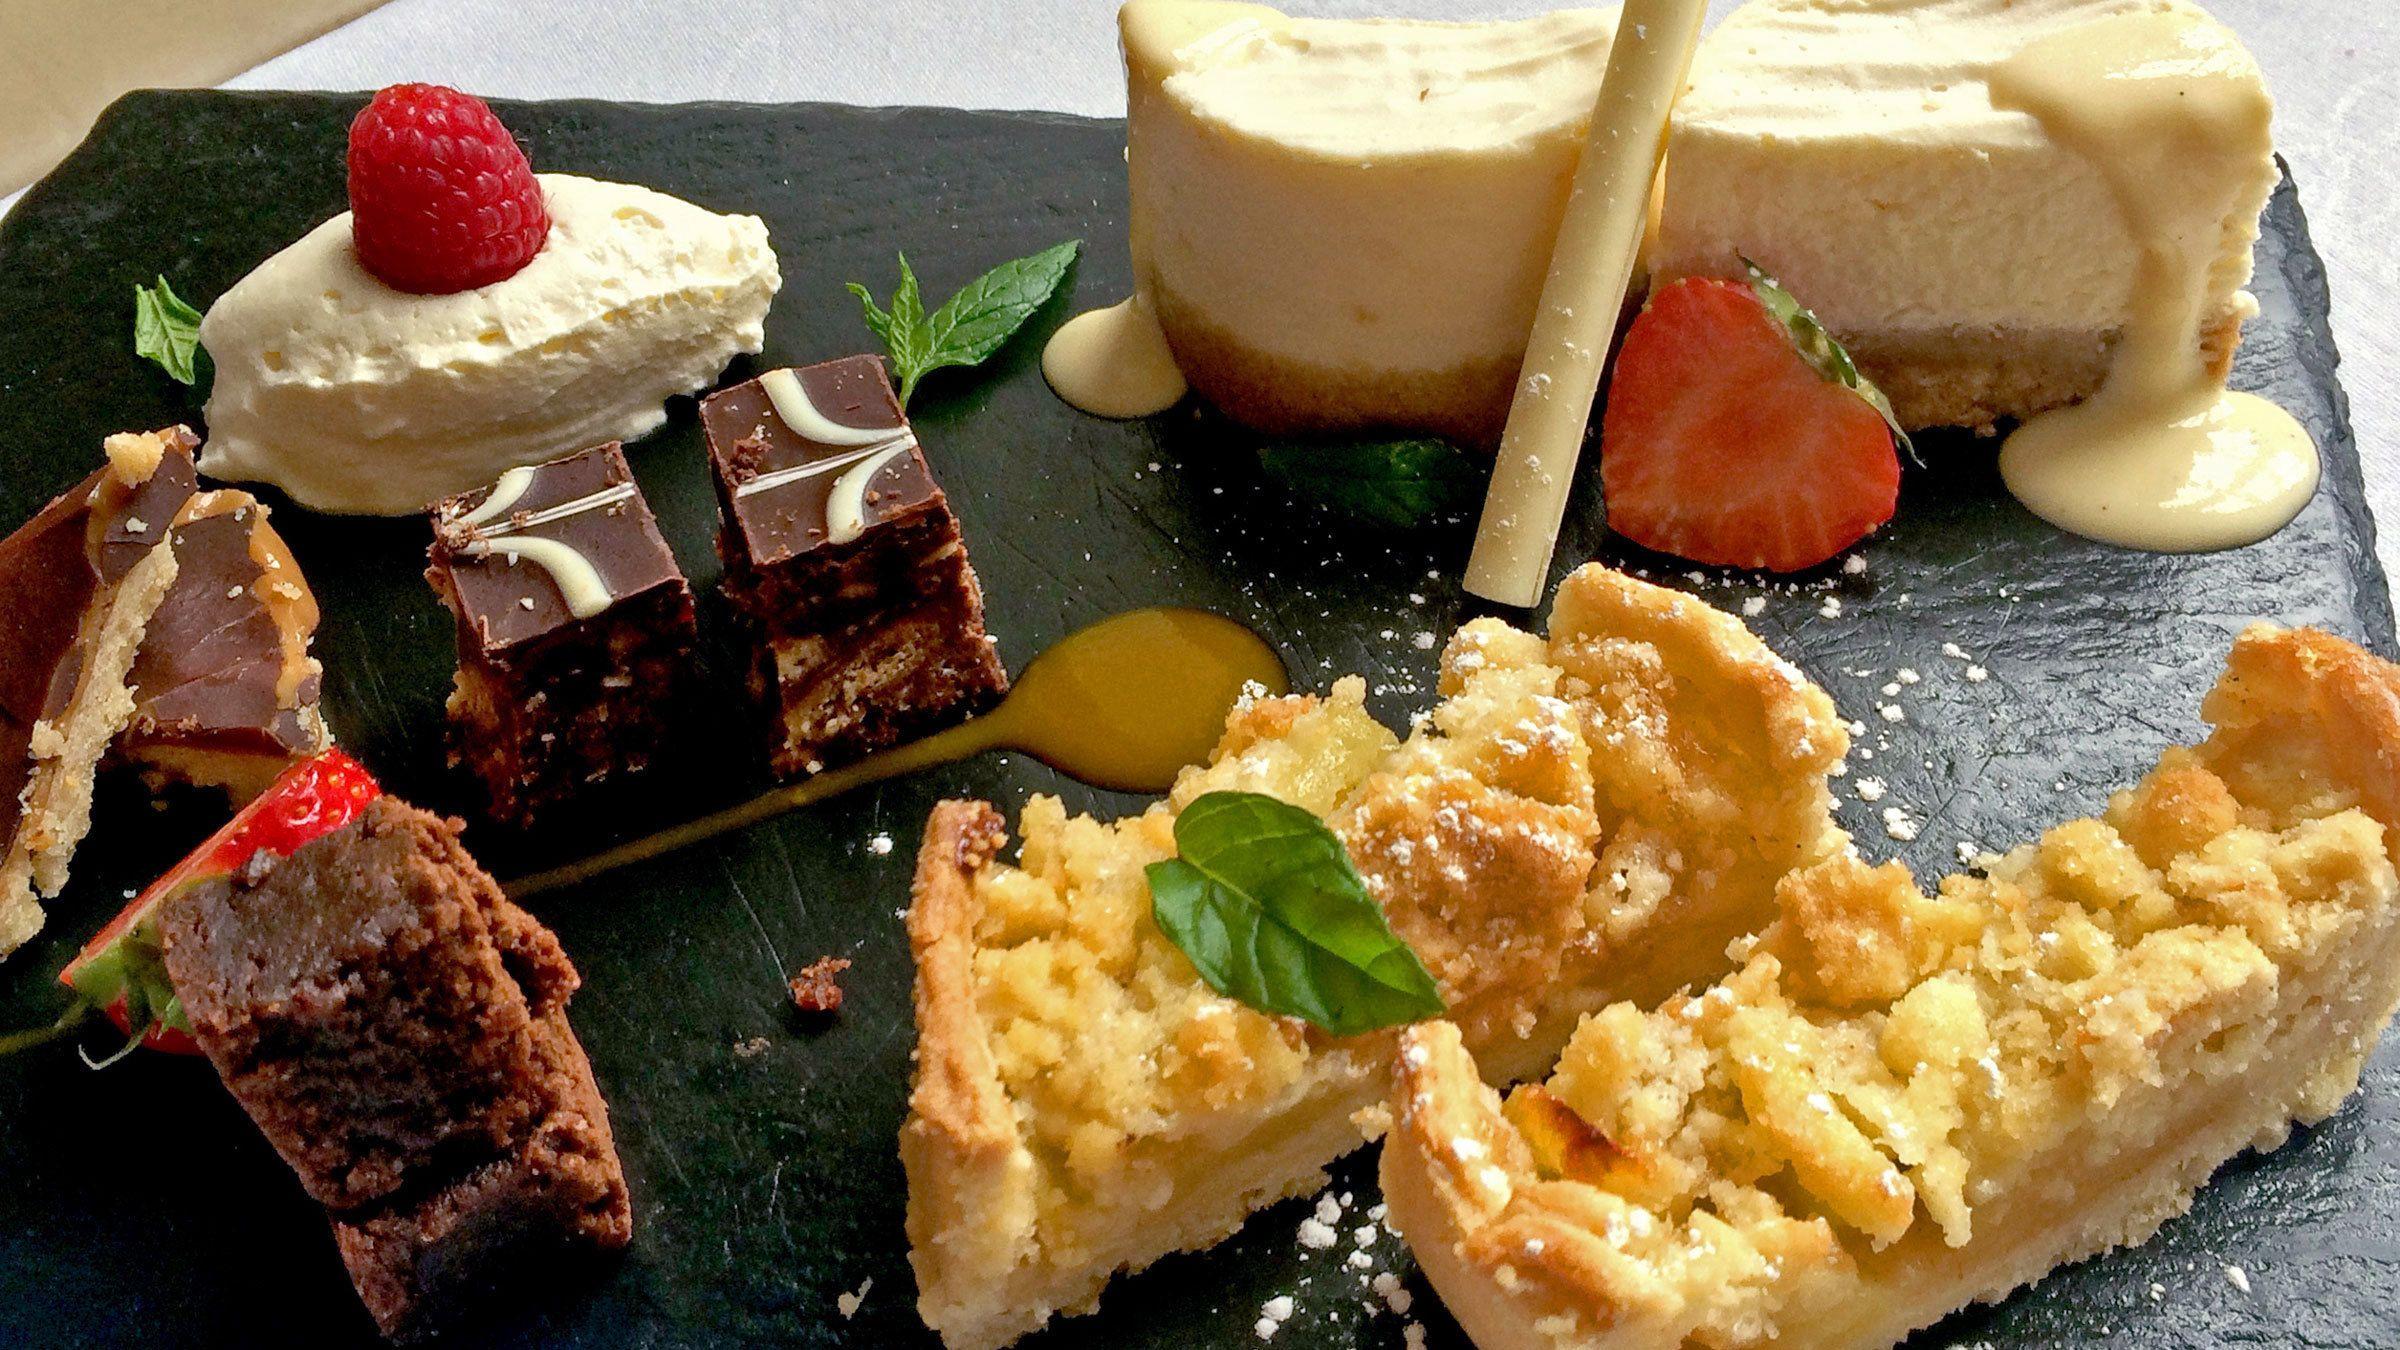 Appetizing dessert on display in Ireland